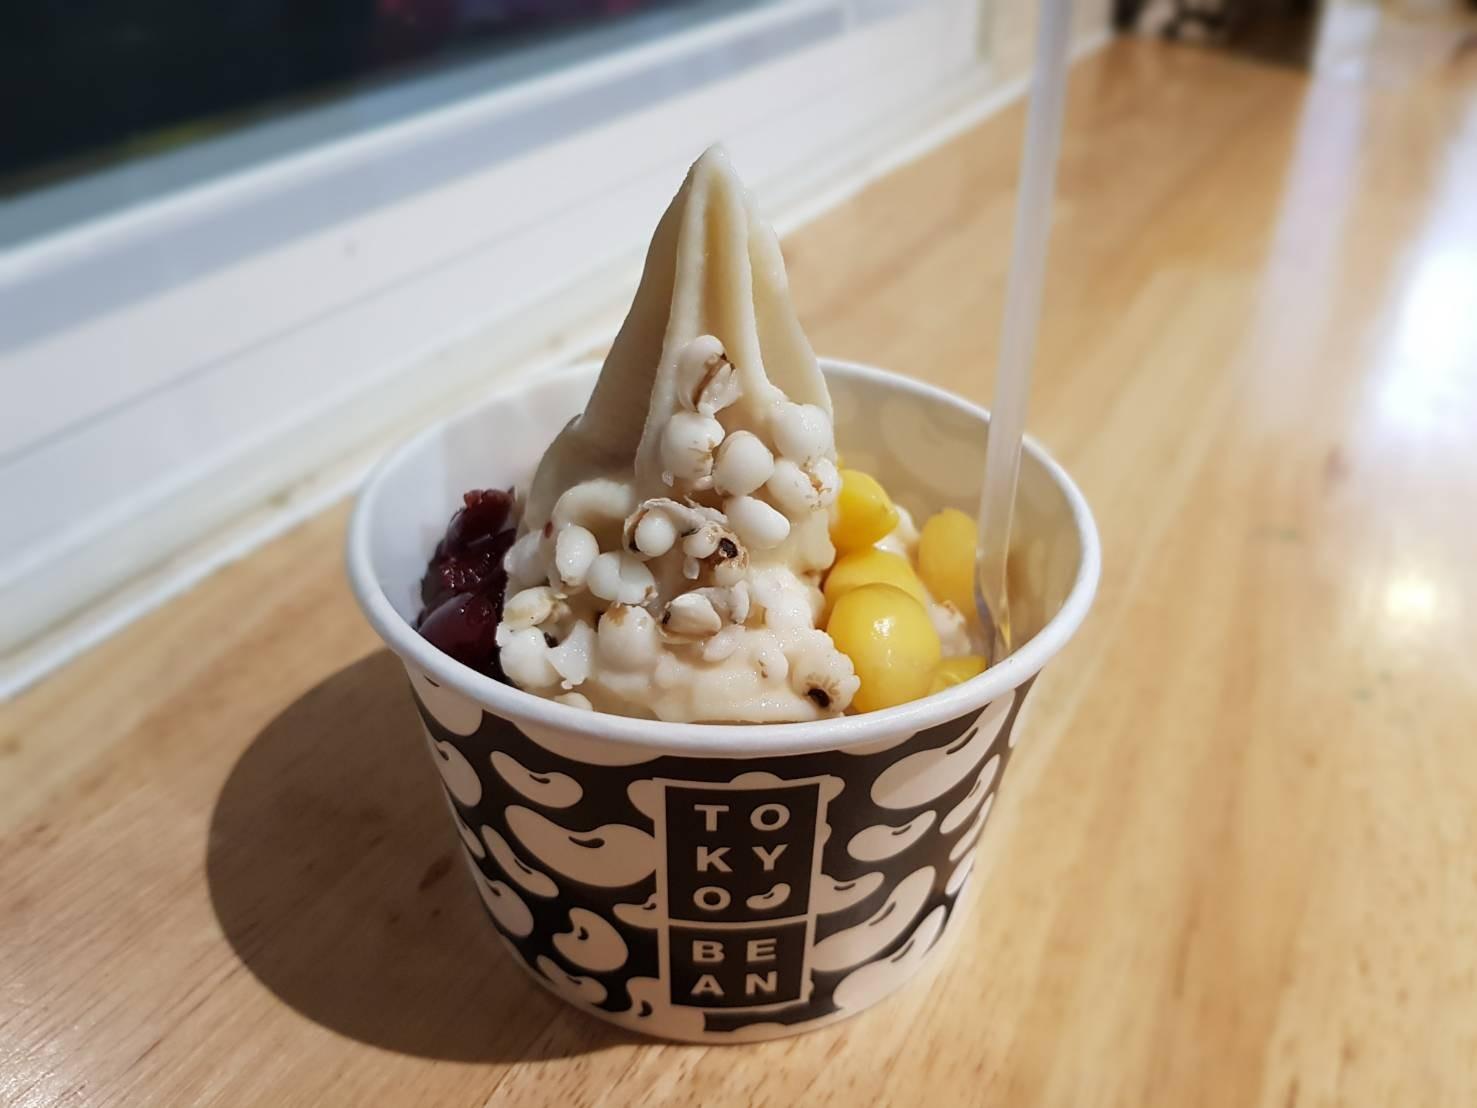 Tokyo bean